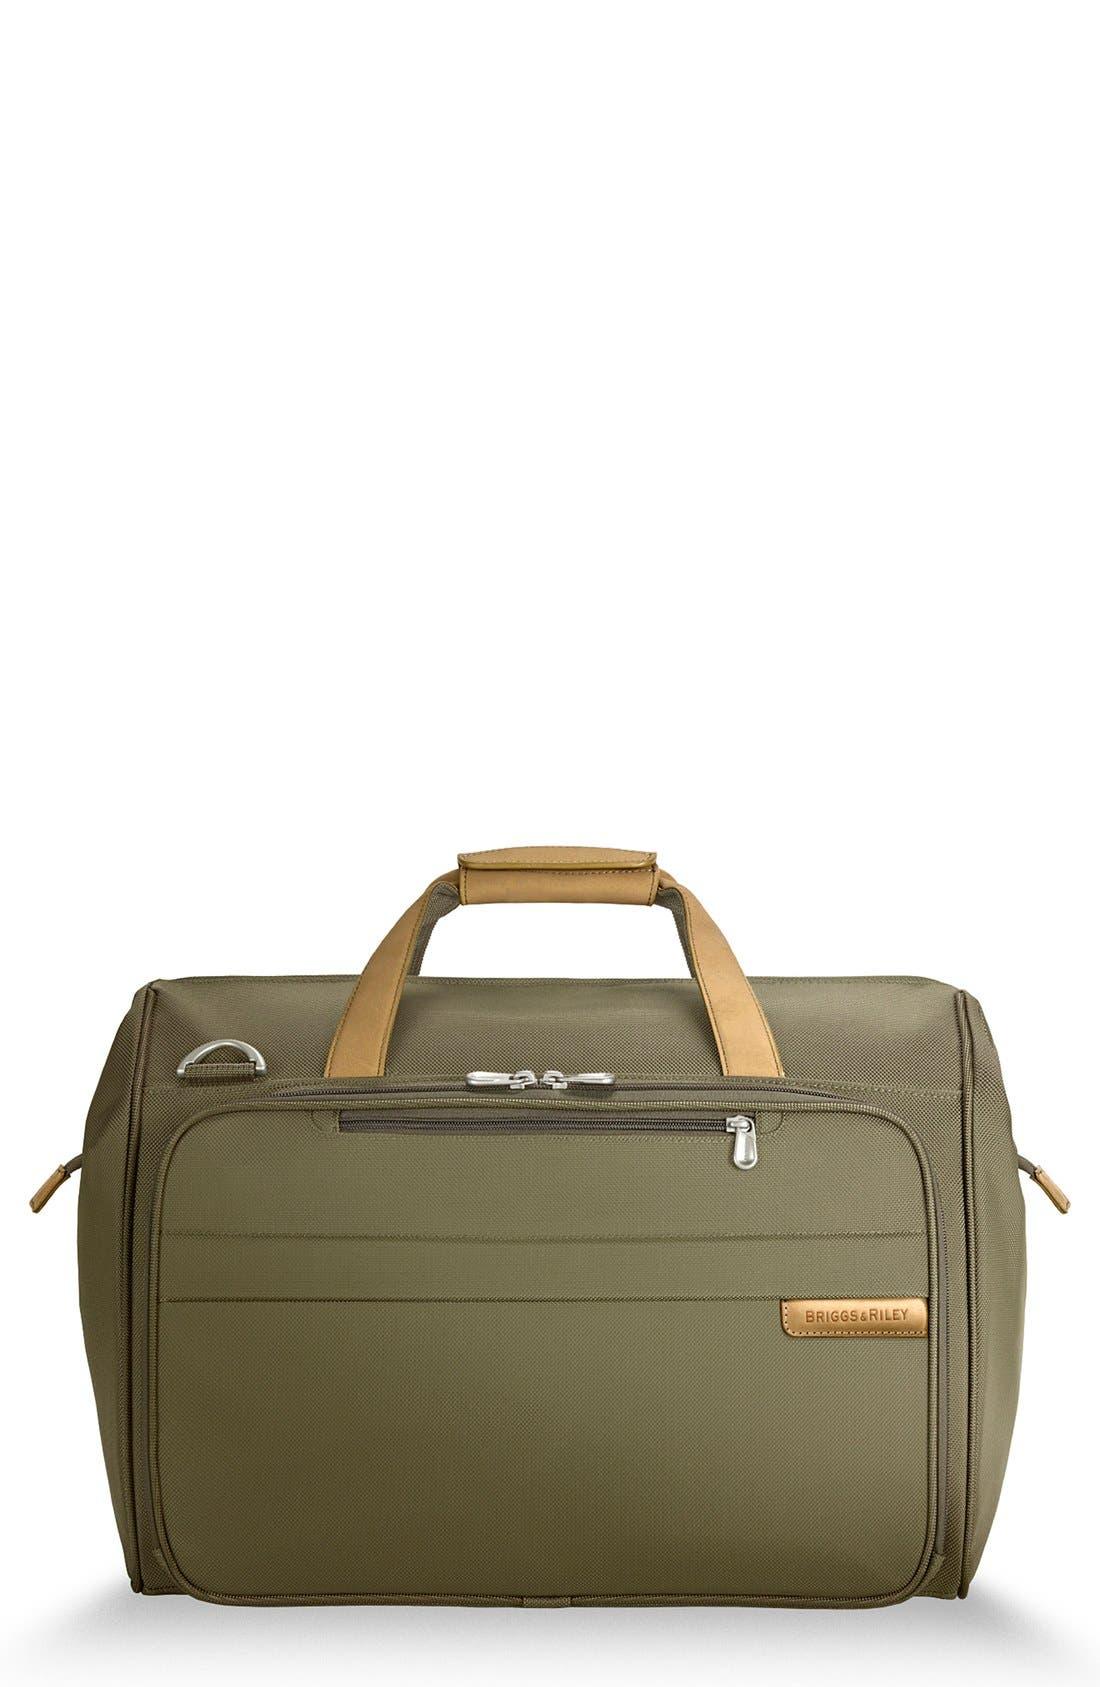 Alternate Image 1 Selected - Briggs & Riley 'Baseline' Duffel Bag